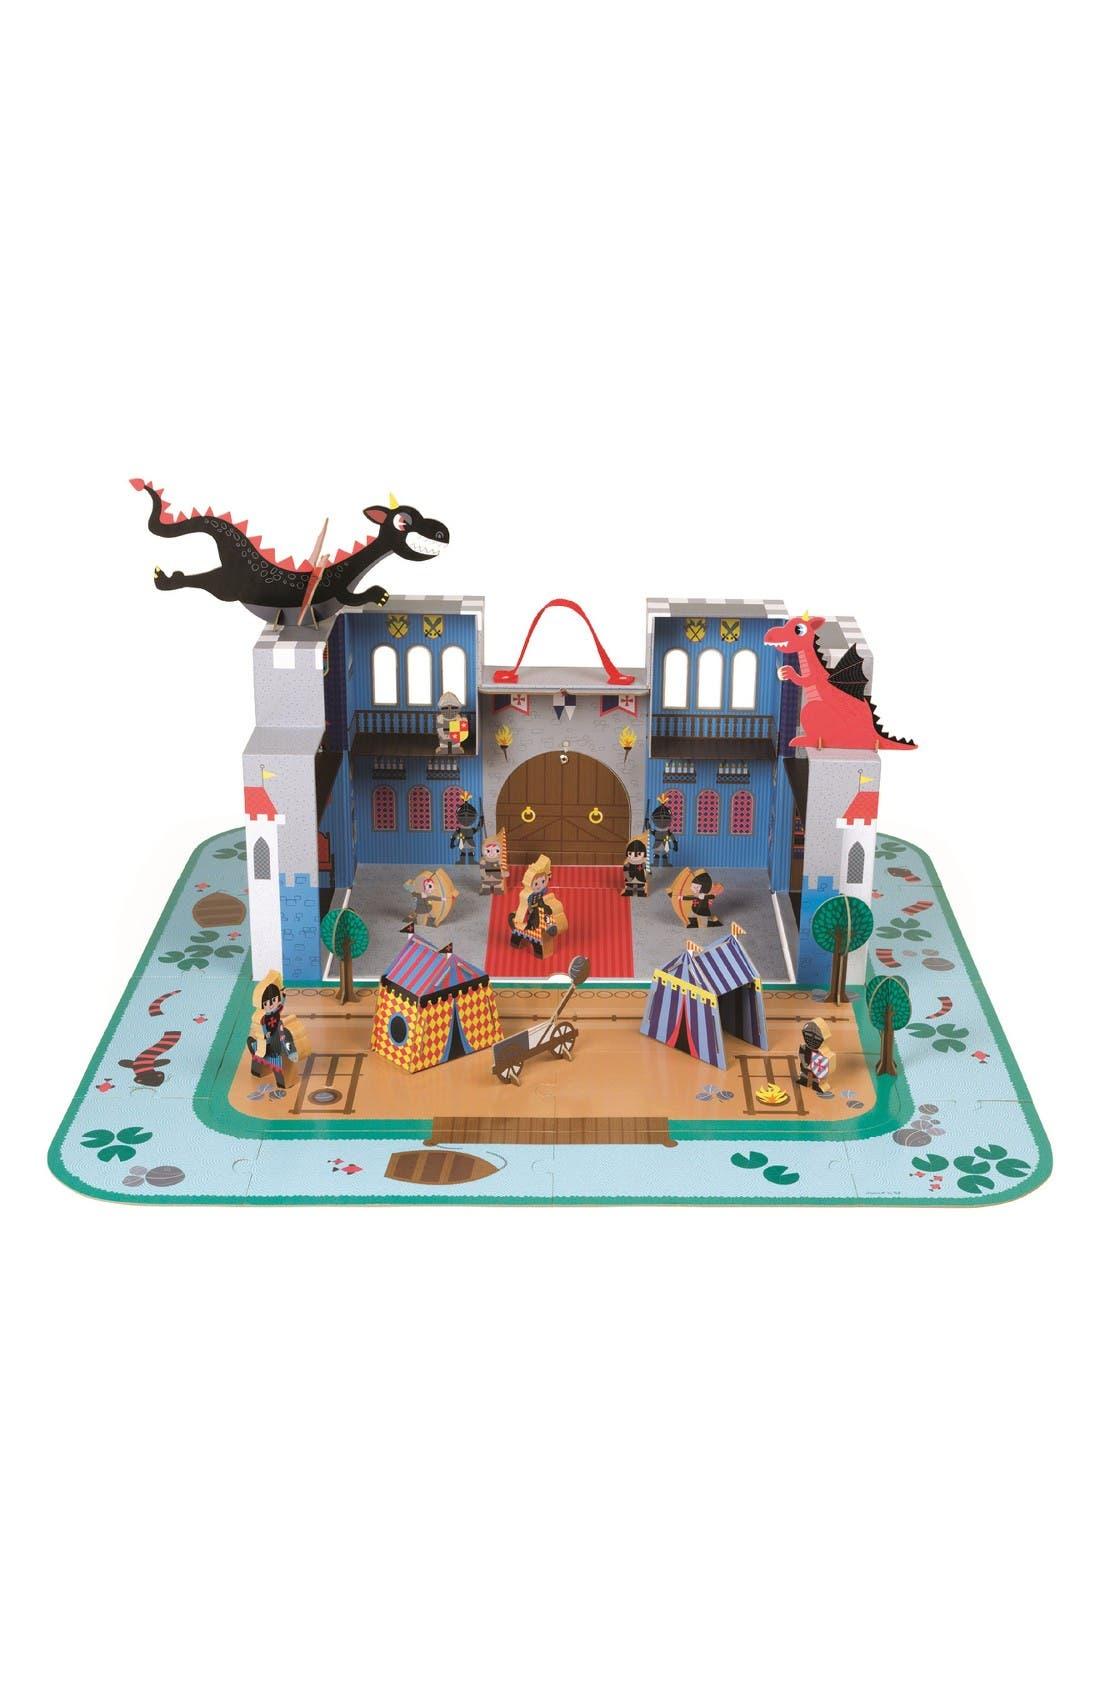 Main Image - Janod The Fantastic Castle Play Set